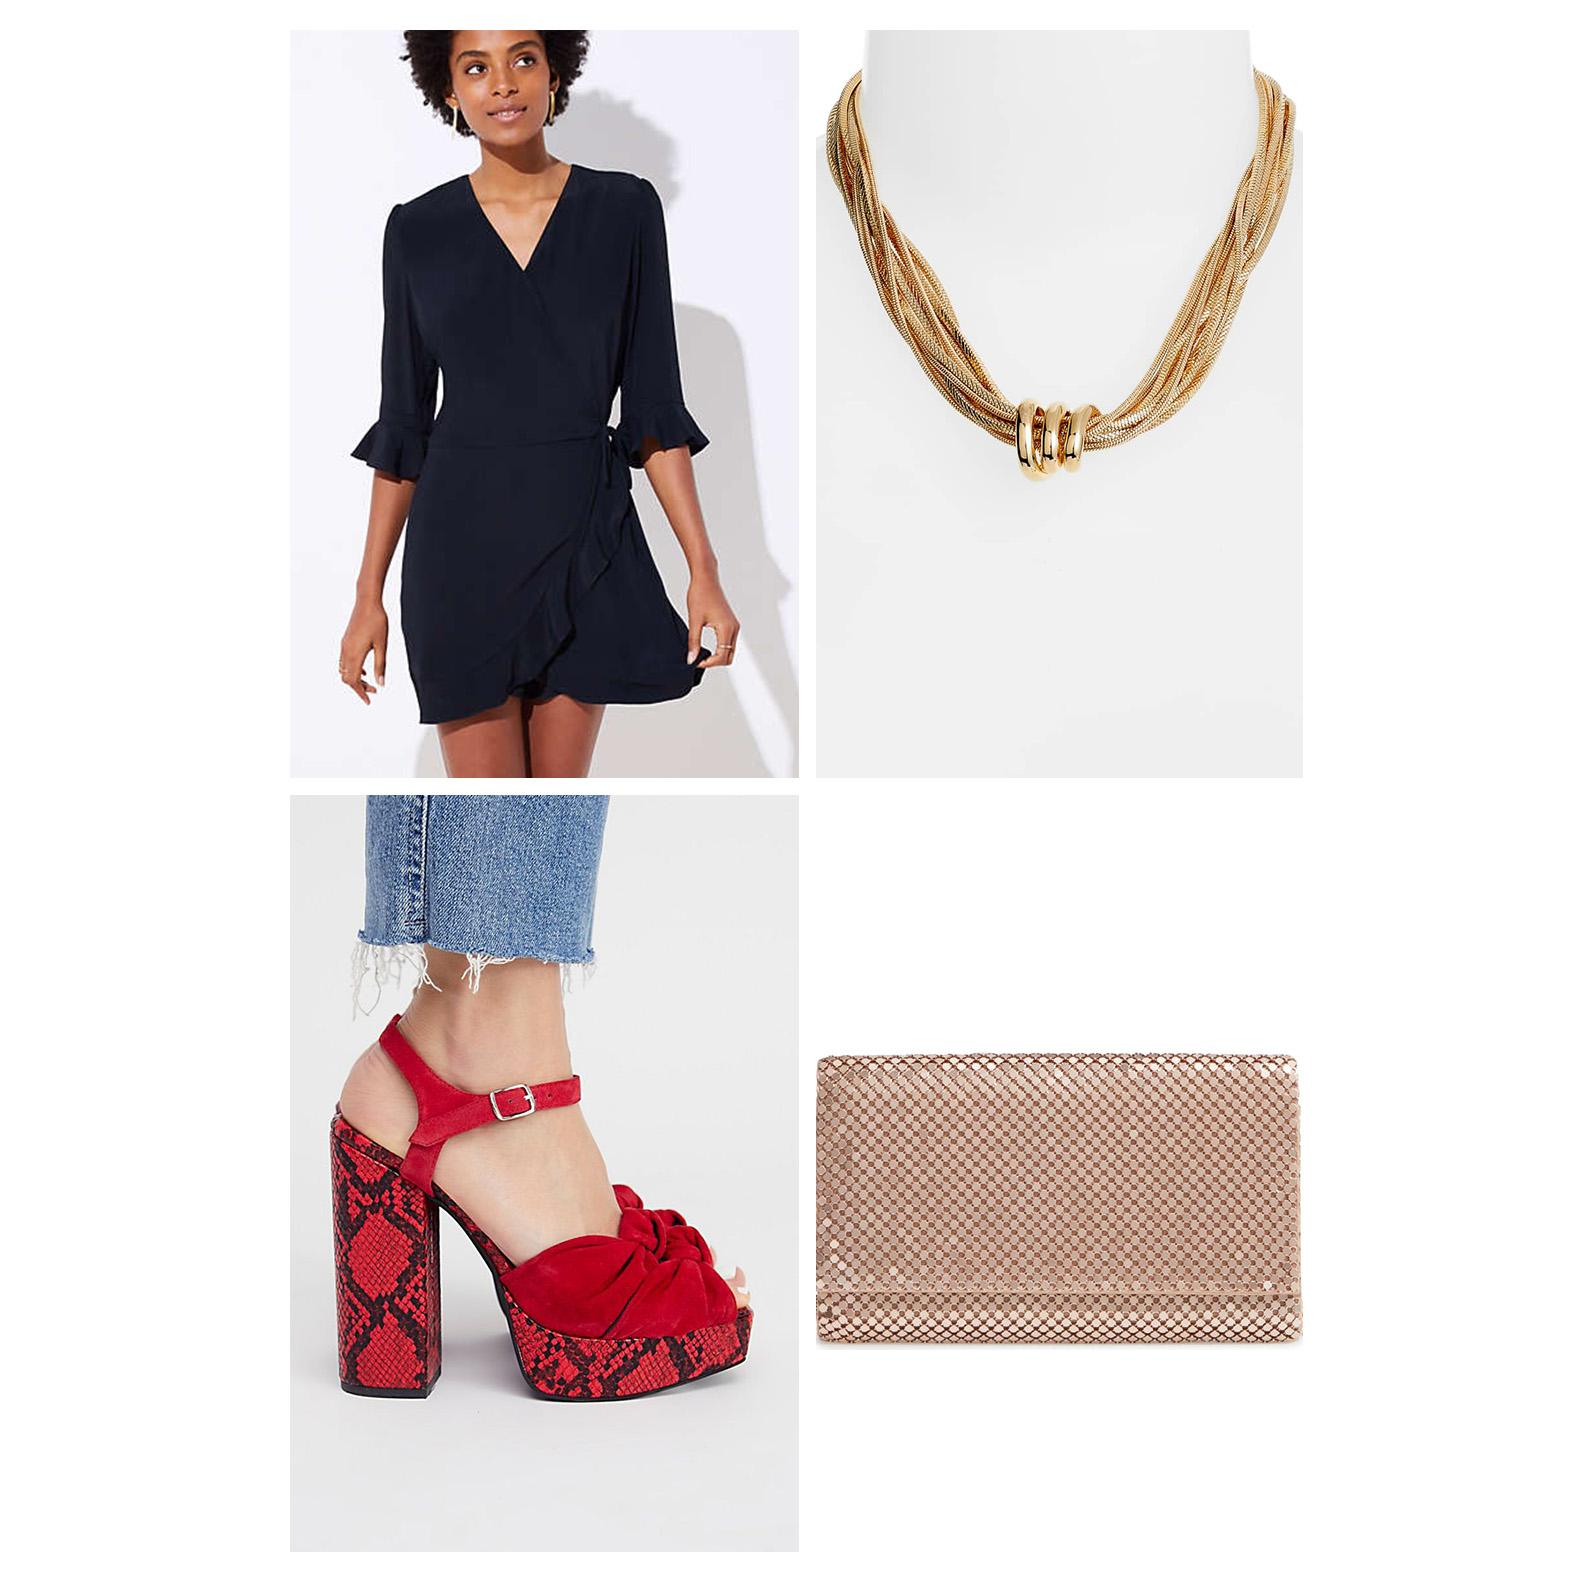 fall-autumn-outfit-dinner-2018-fashion-ideas-black-romper-ruffle-red-snakeskin-sandal-heels-platform-gold-collar-necklace-clutch-dressy-date-night.jpg